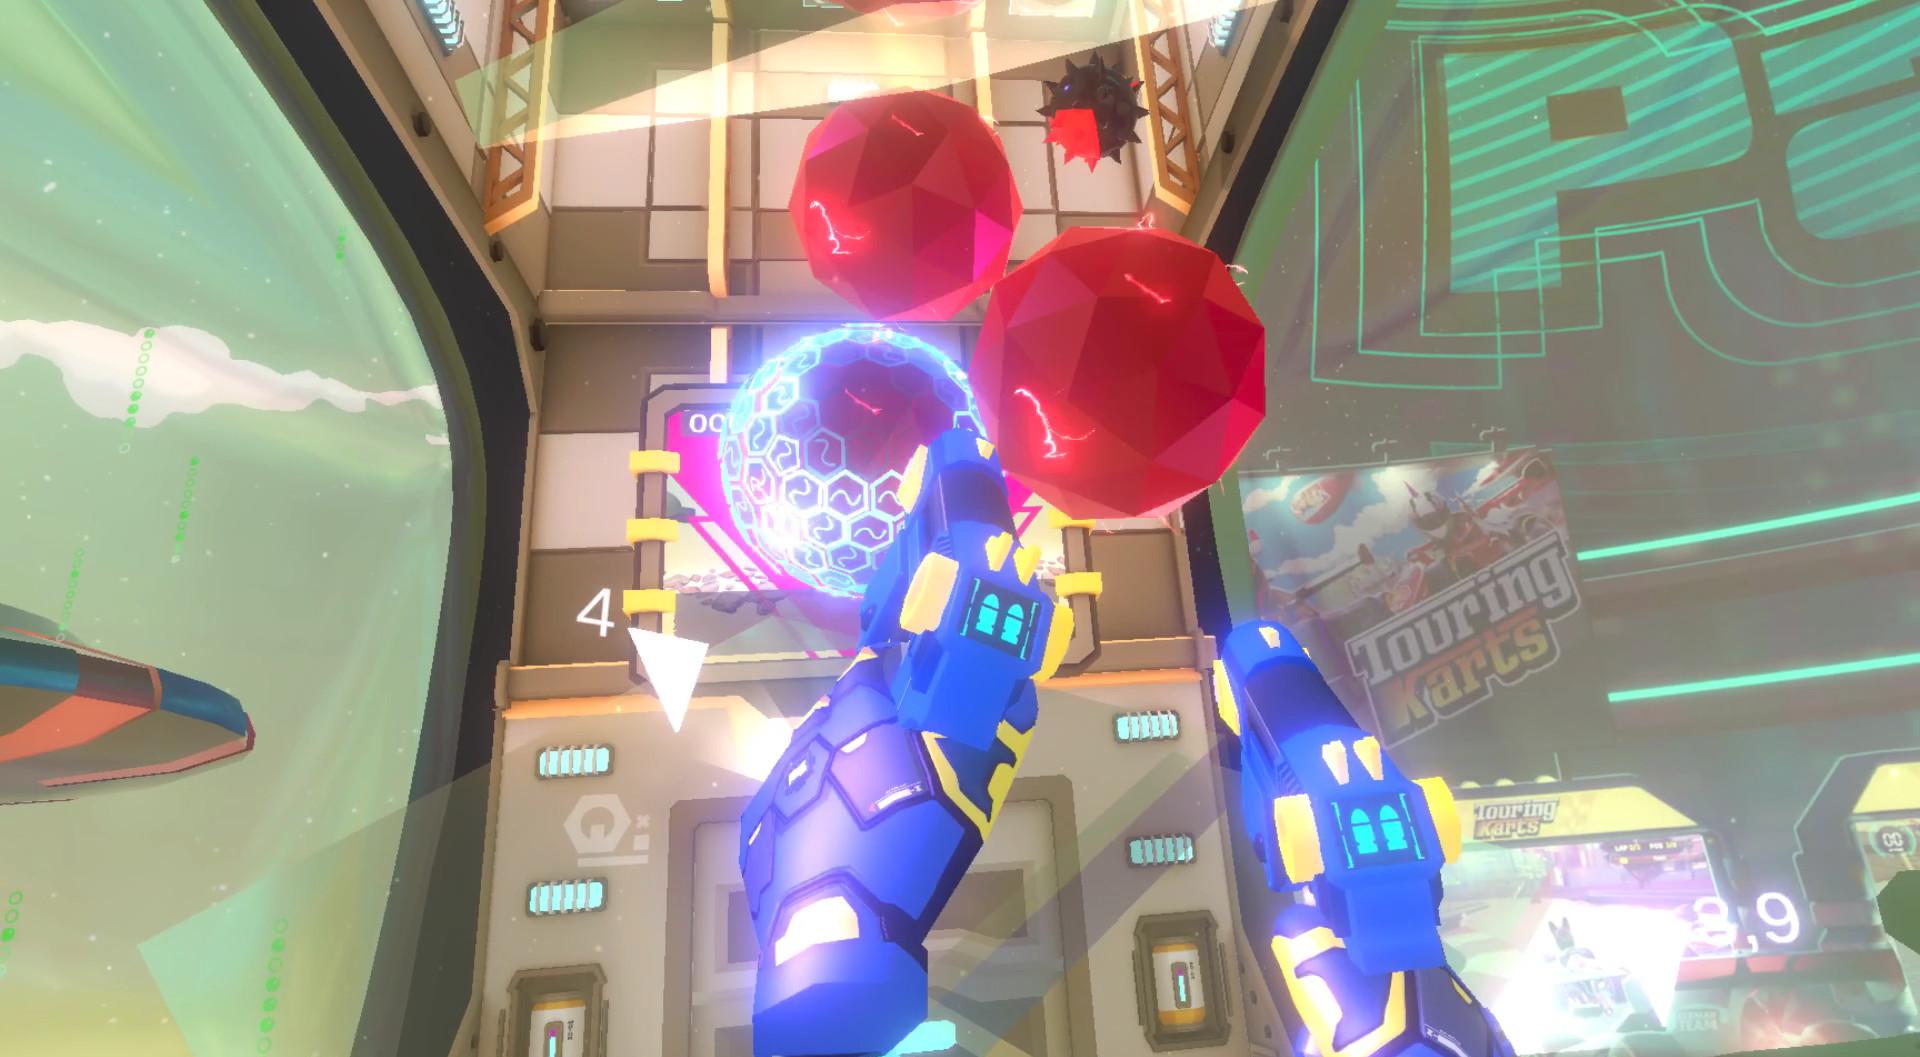 Oculus Quest 游戏《Pangman VR》射击球插图(1)